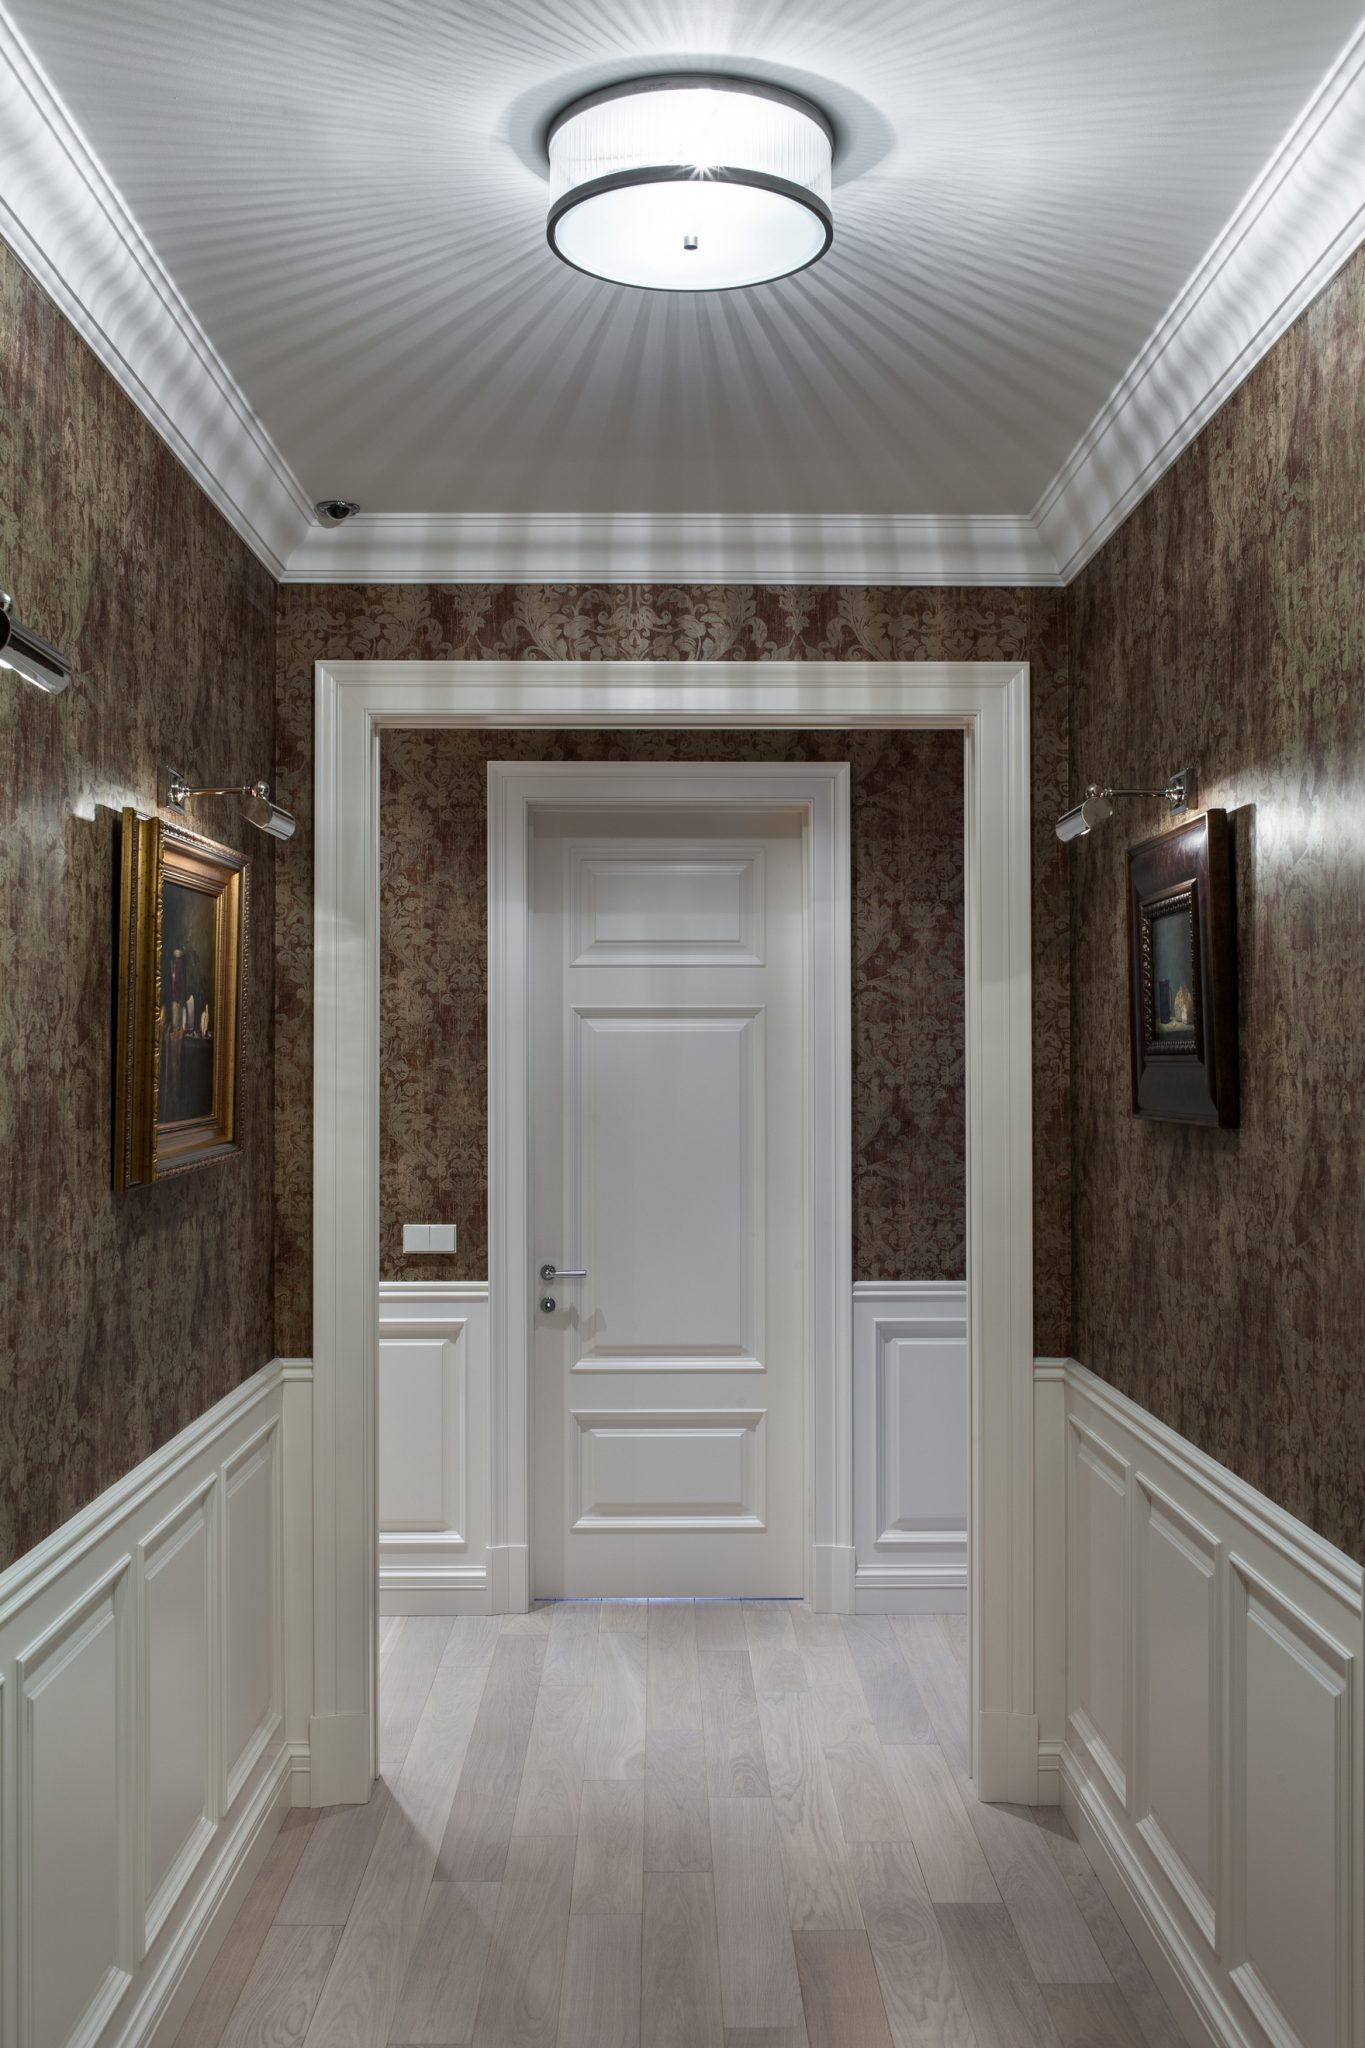 Отделка коридора панелями контрастными